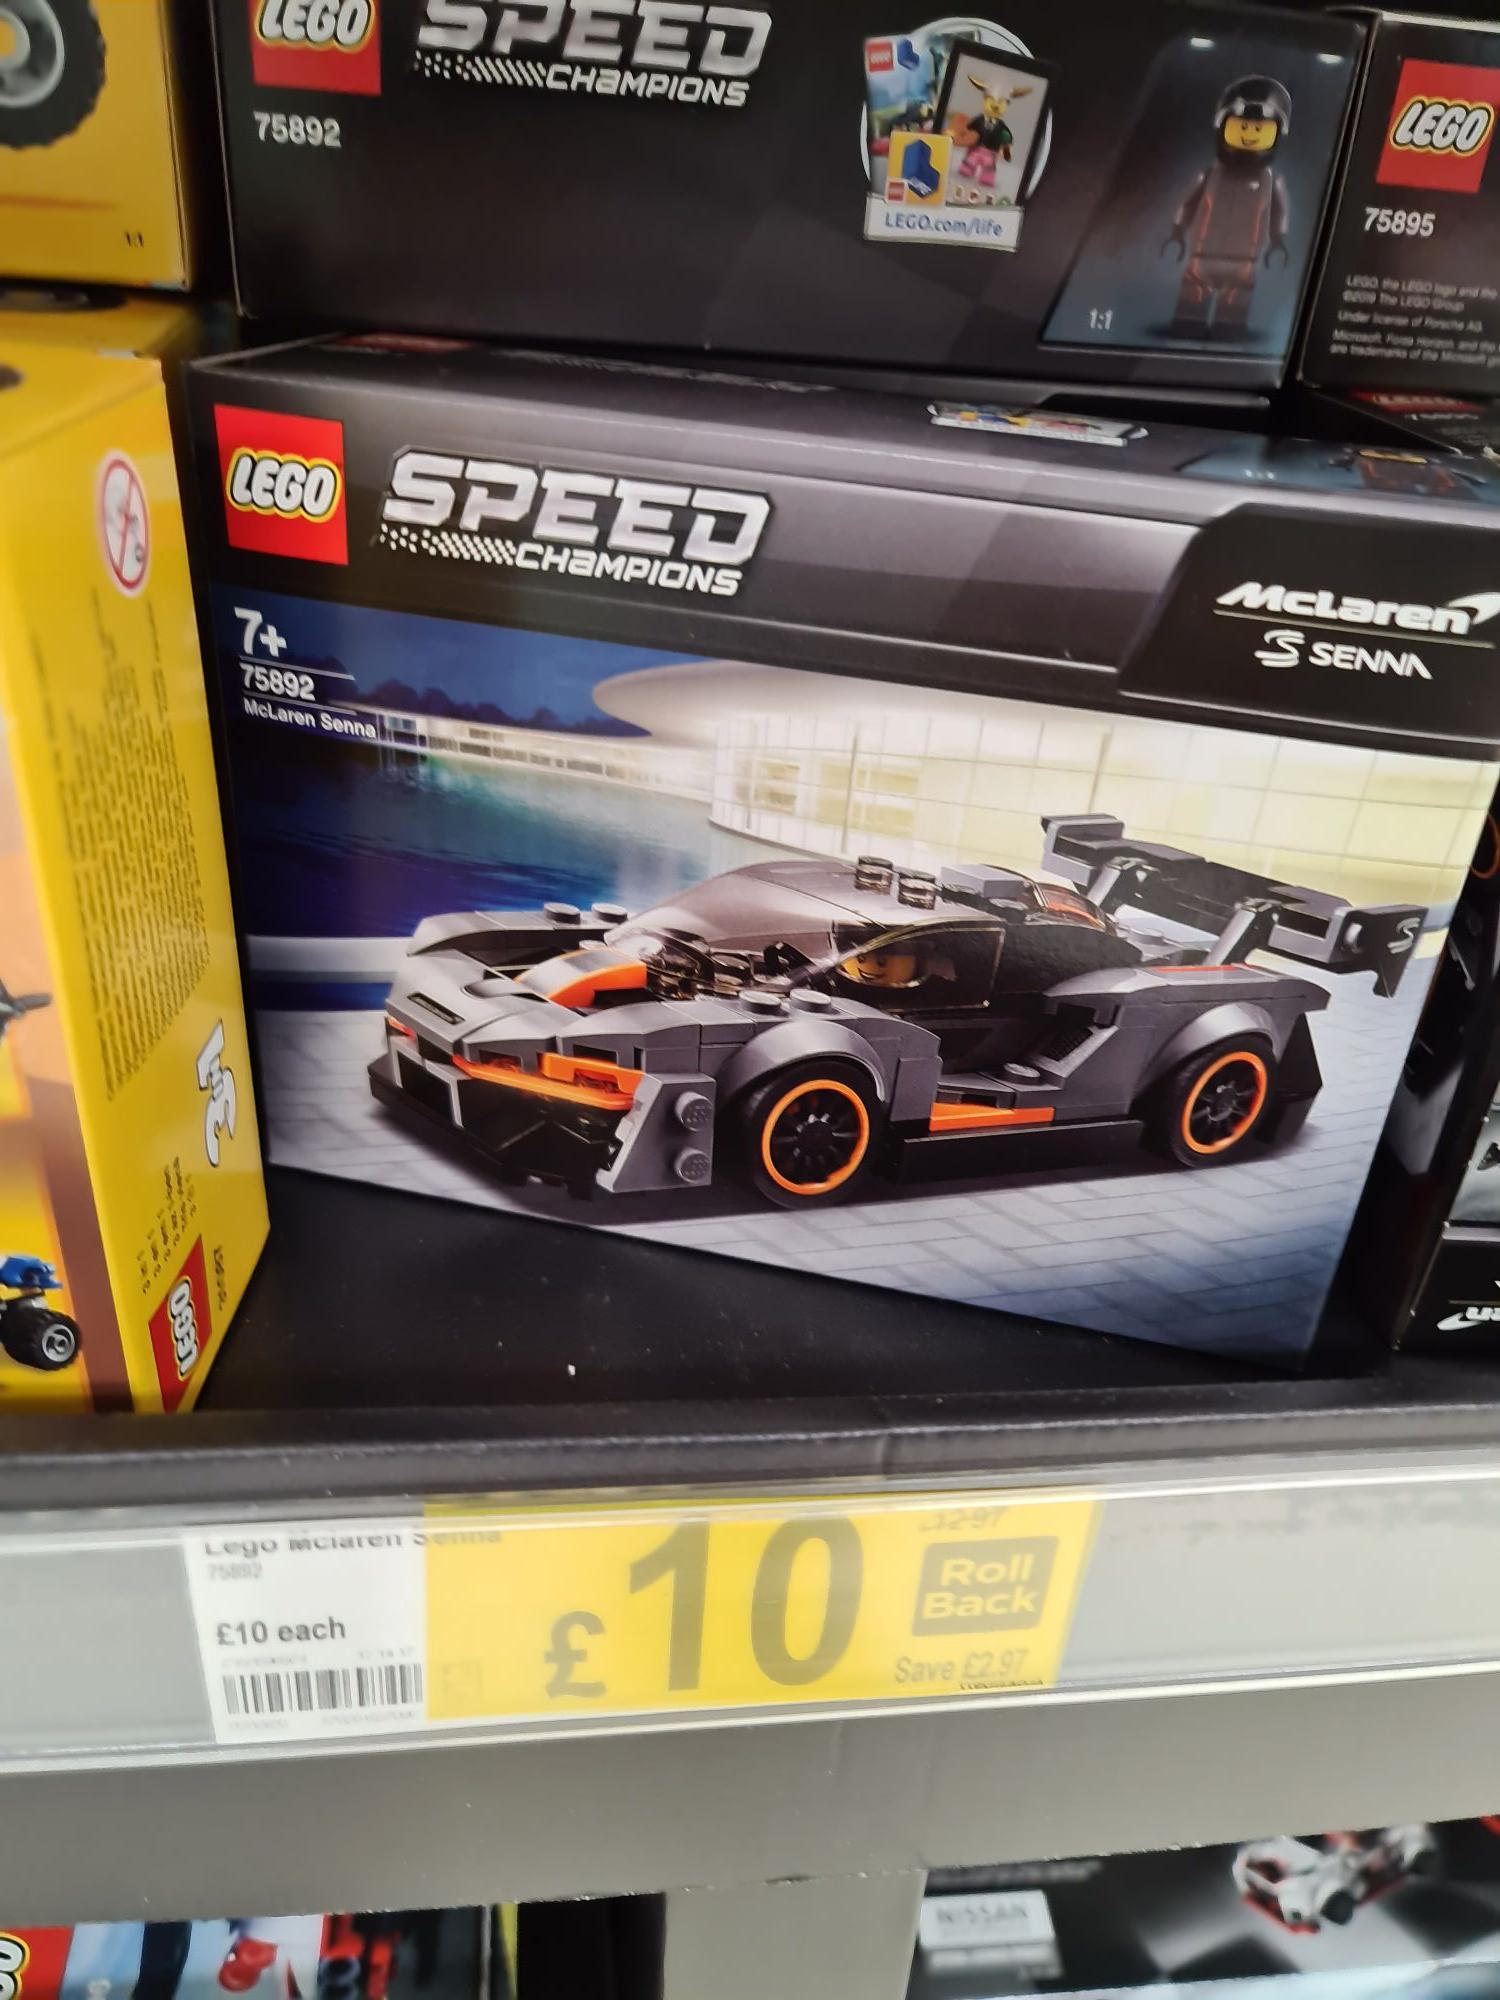 Lego Speed champions McClaren - £10 Instore @ Asda (Merseyside)